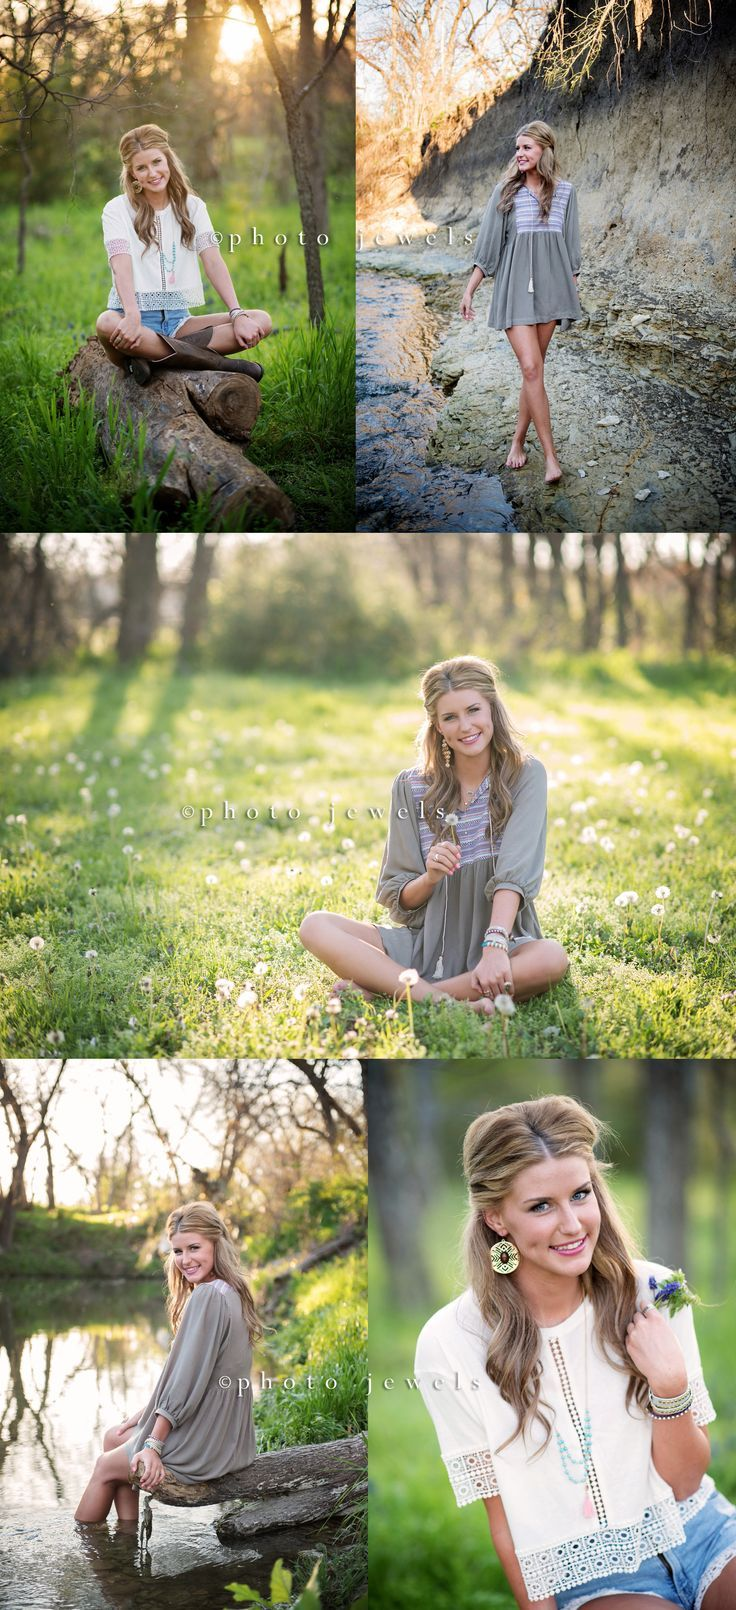 senior, senior girl, senior pictures, senior year, photo jewels ...